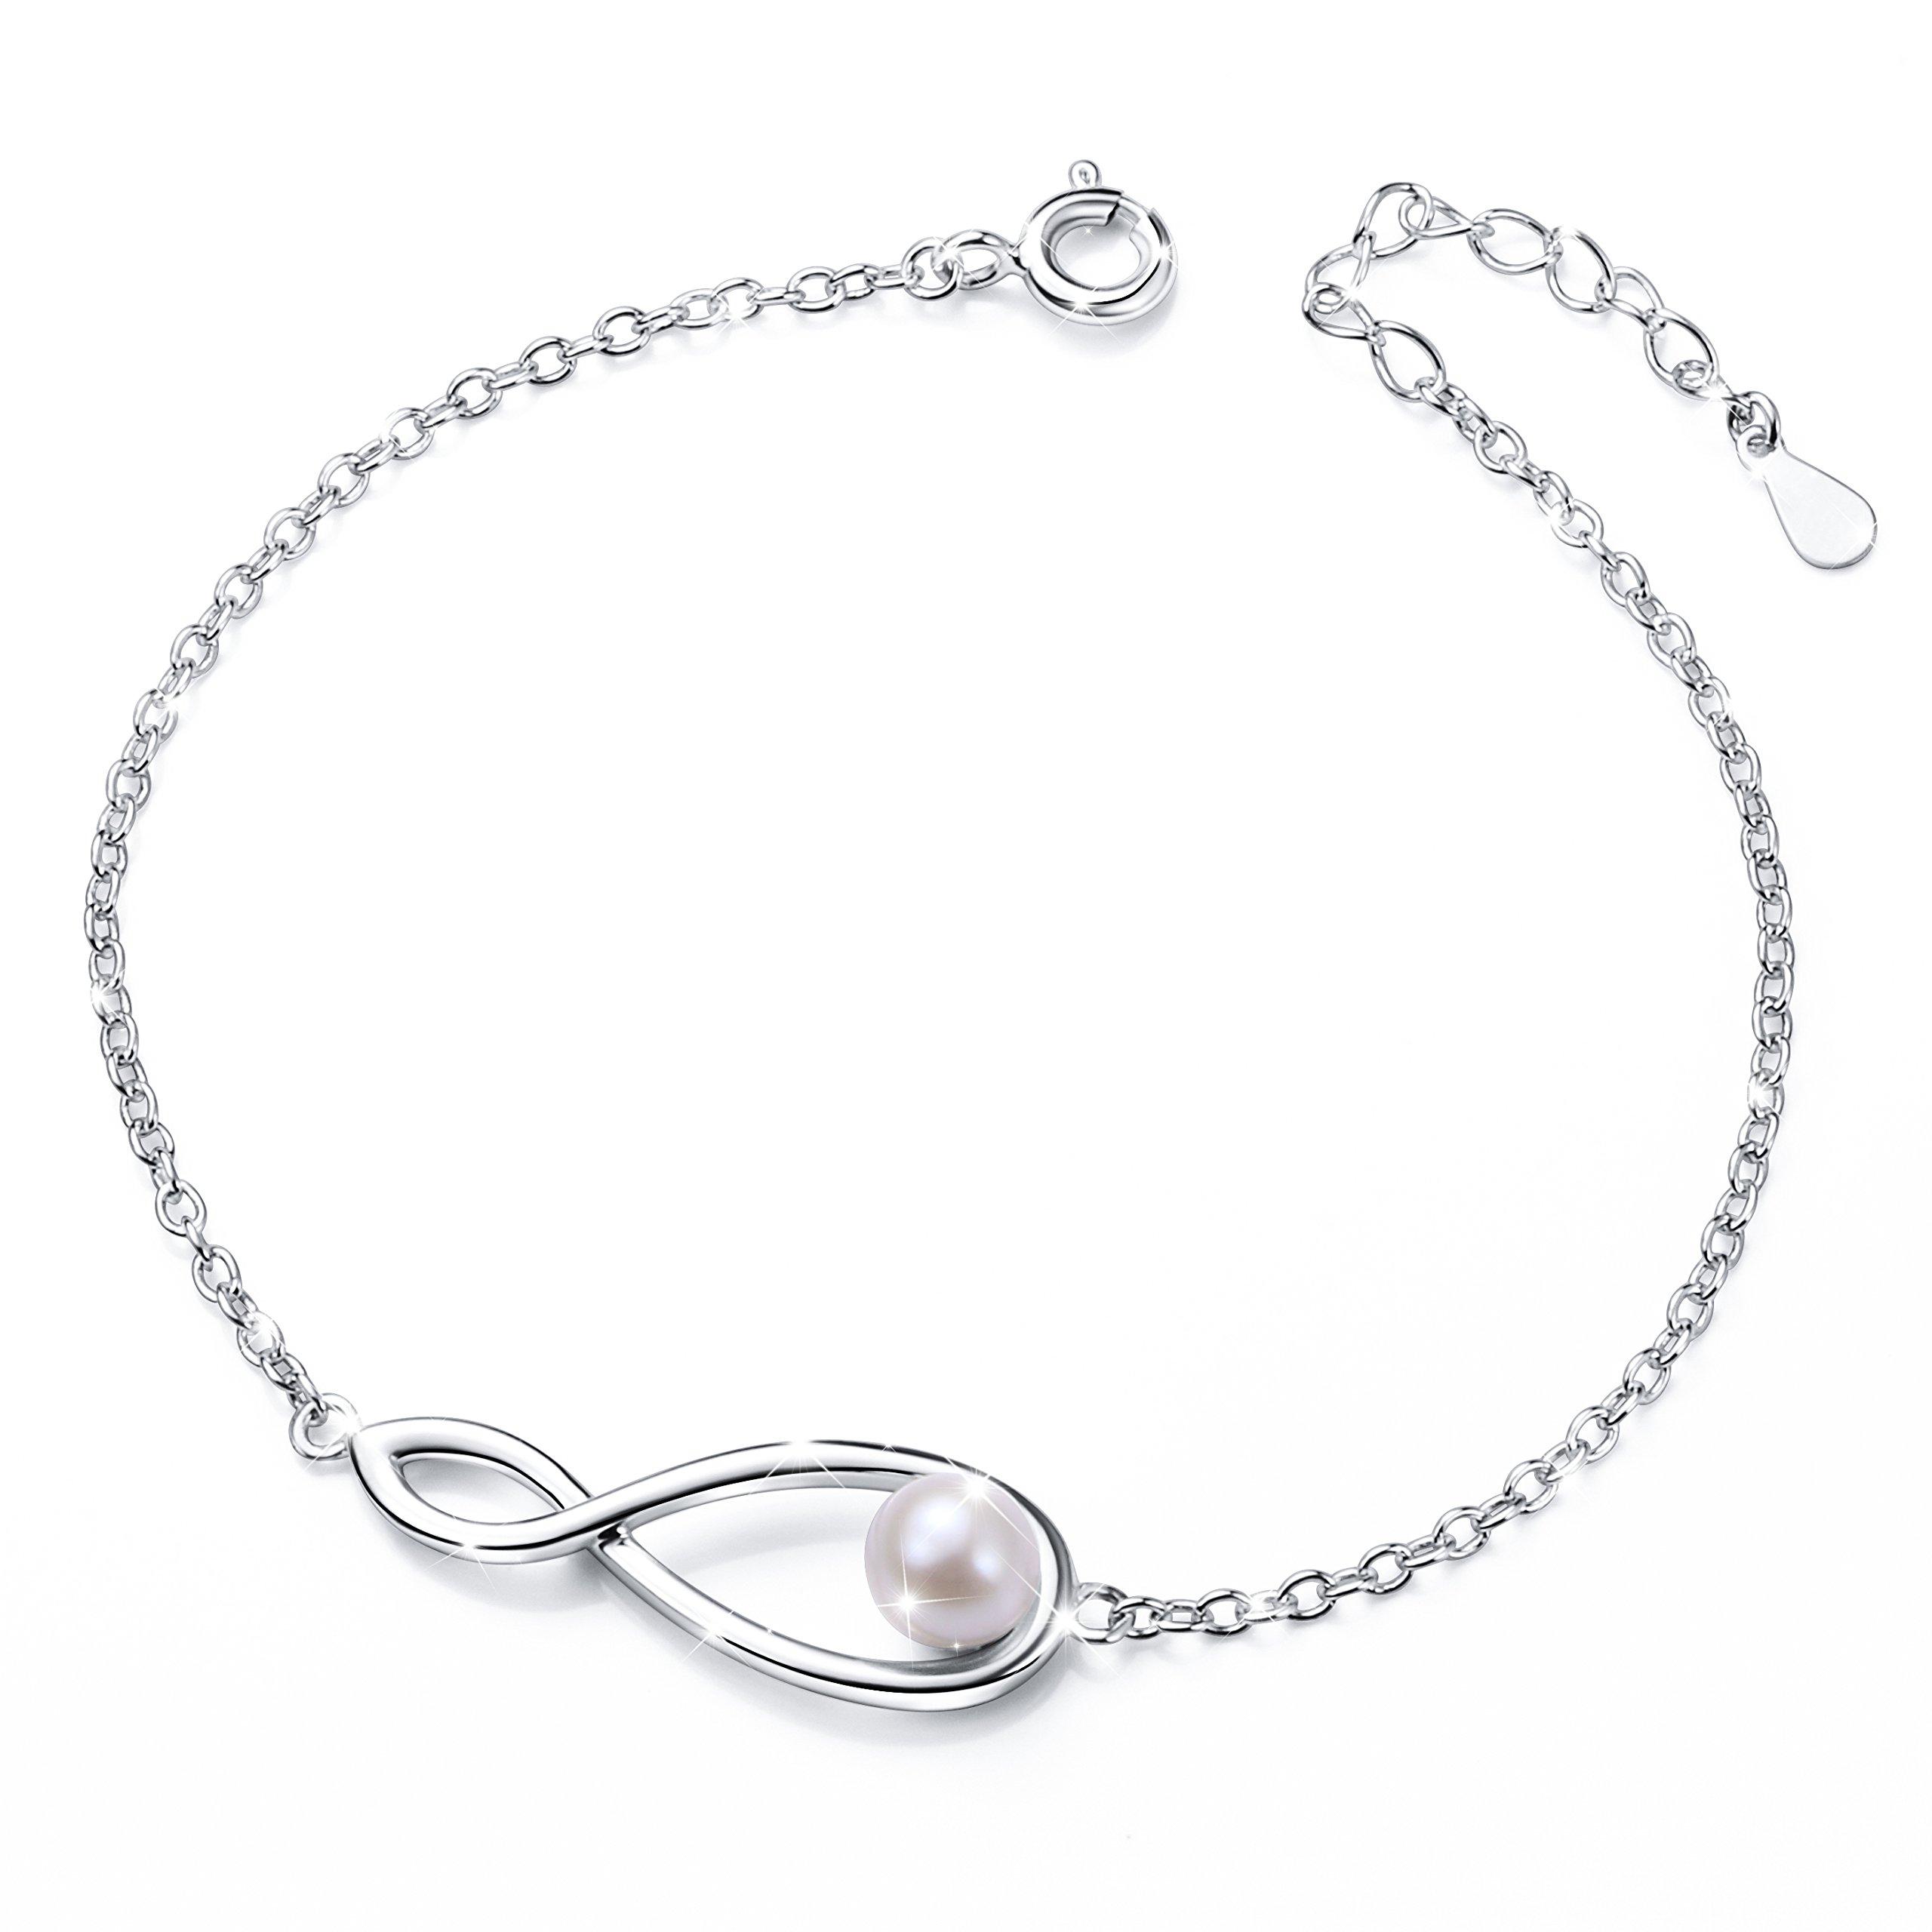 925 Sterling Silver Freshwater Cultured Pearl Adjustable Infinity Bracelet Women by DAOCHONG